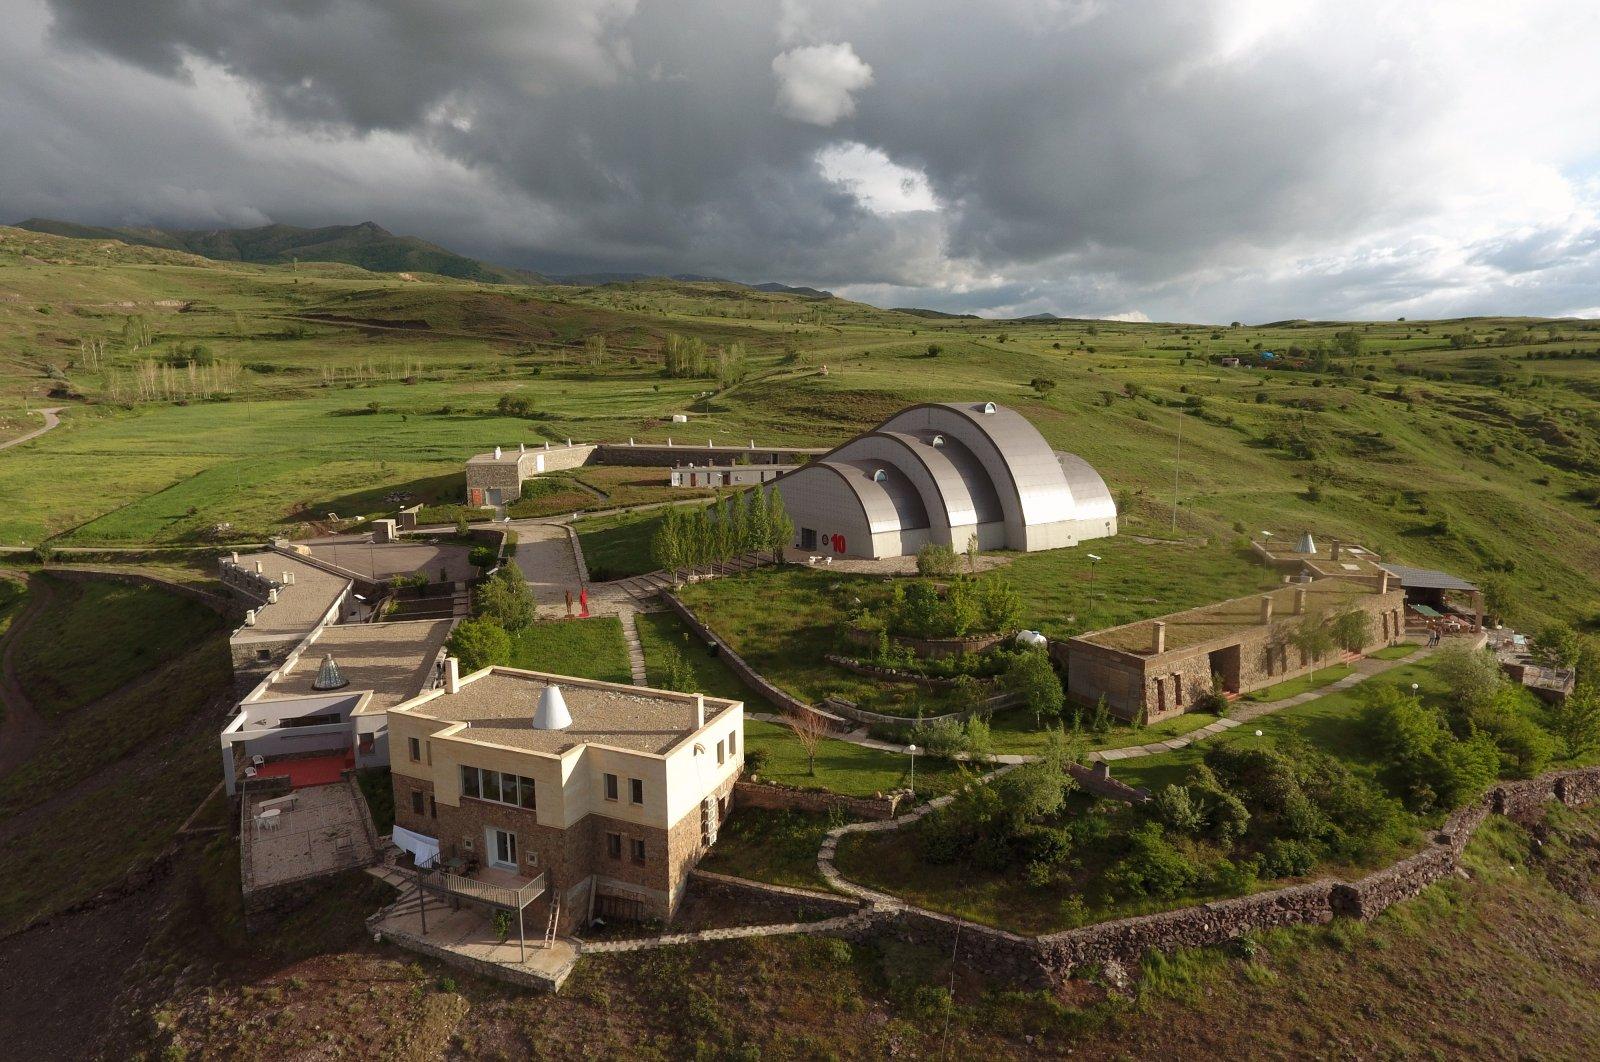 The Baksı Museum is located on a hill overlooking the Çoruh Valley in Bayburt, Turkey.